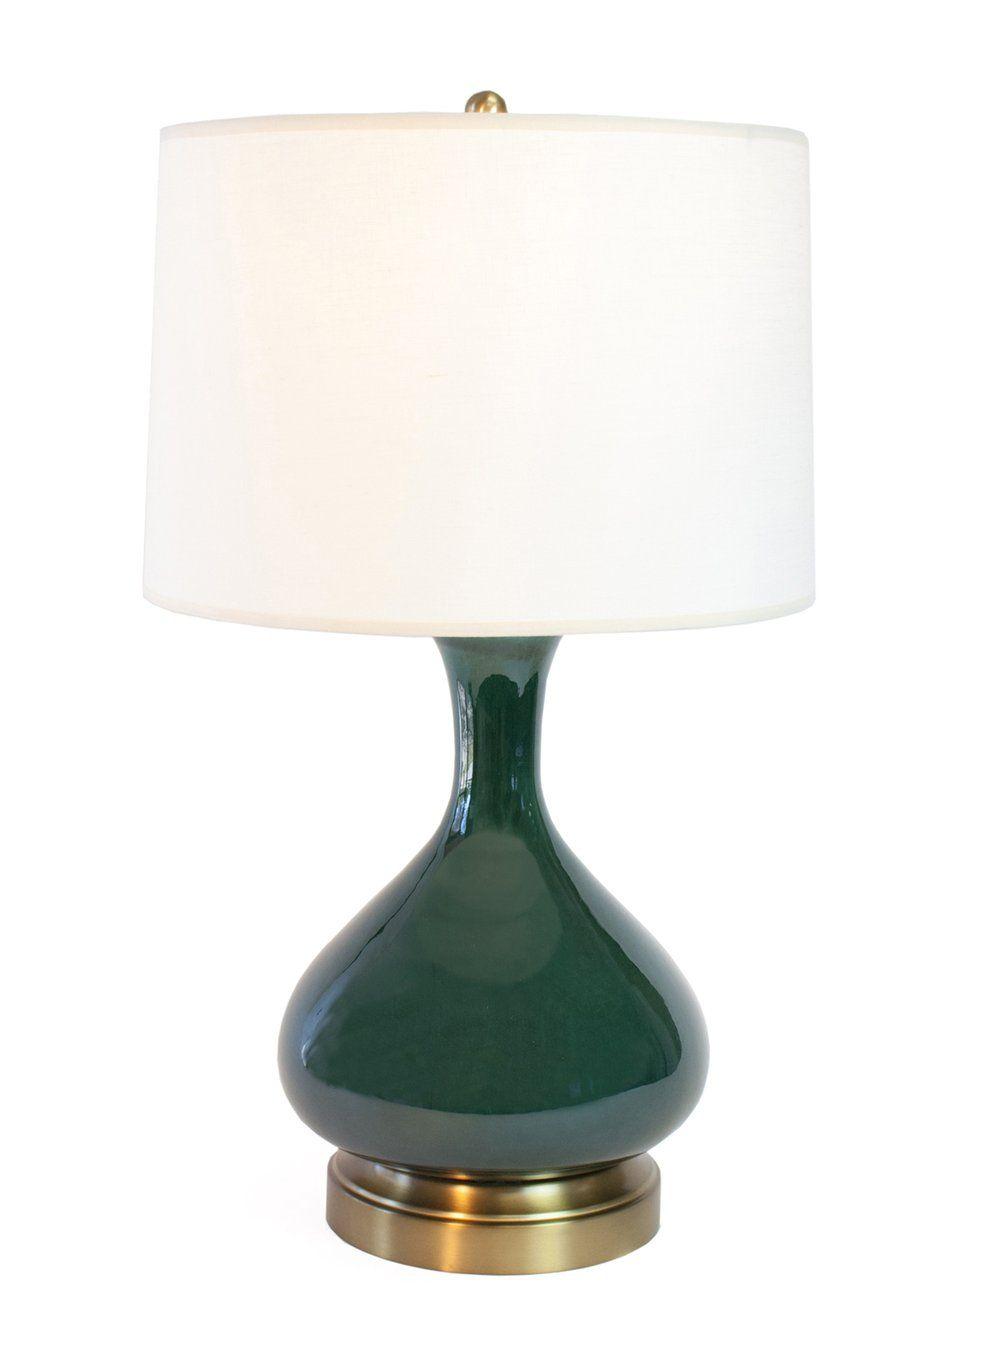 Bartlett Emerald Cordless Lamp Made In The Usa Cordless Lamps Lamp Modern Lanterns